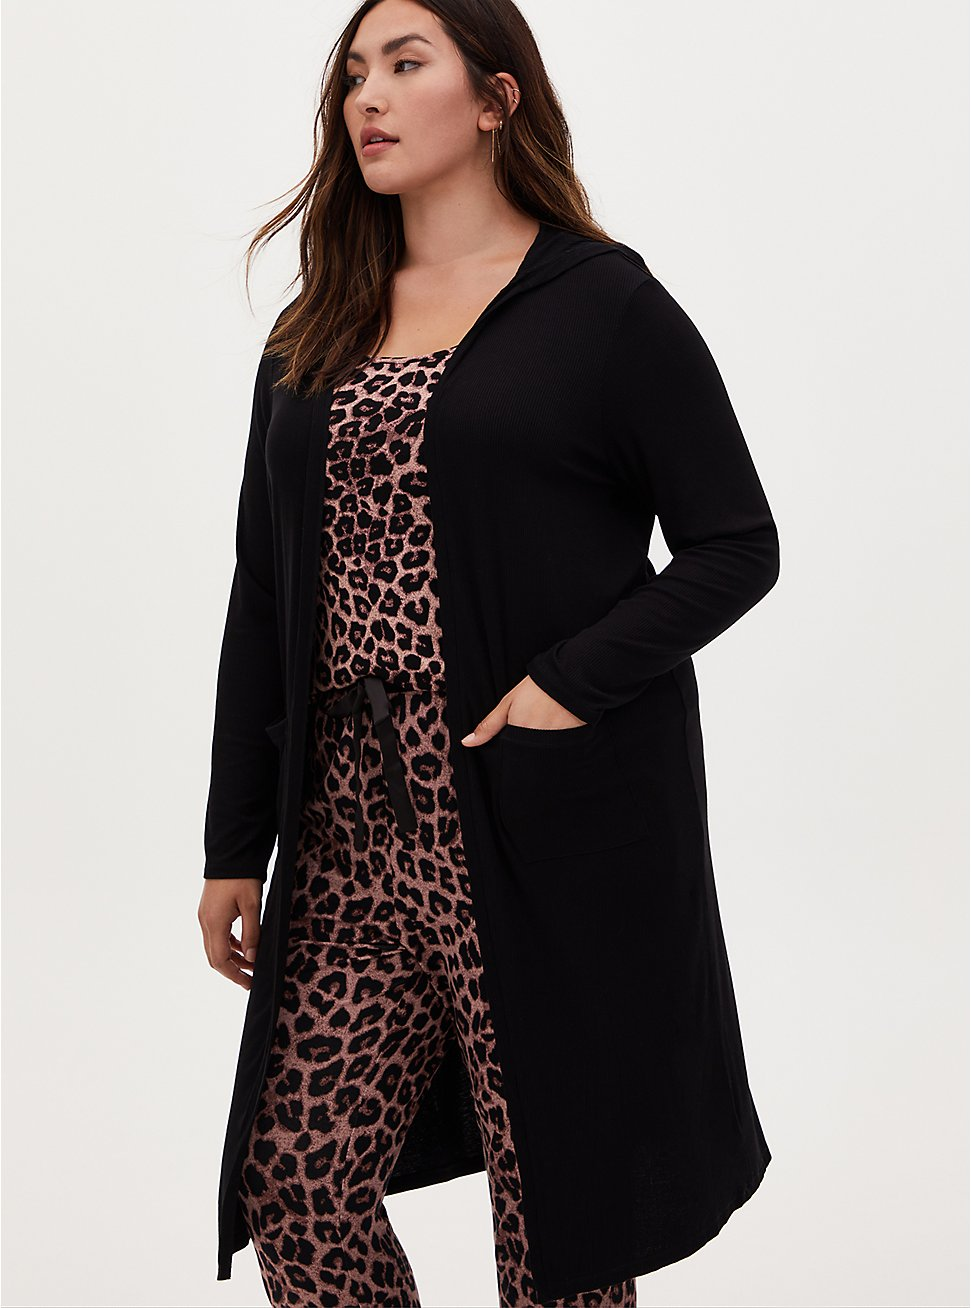 Super Soft Black Rib Hooded Sleep Robe, DEEP BLACK, hi-res